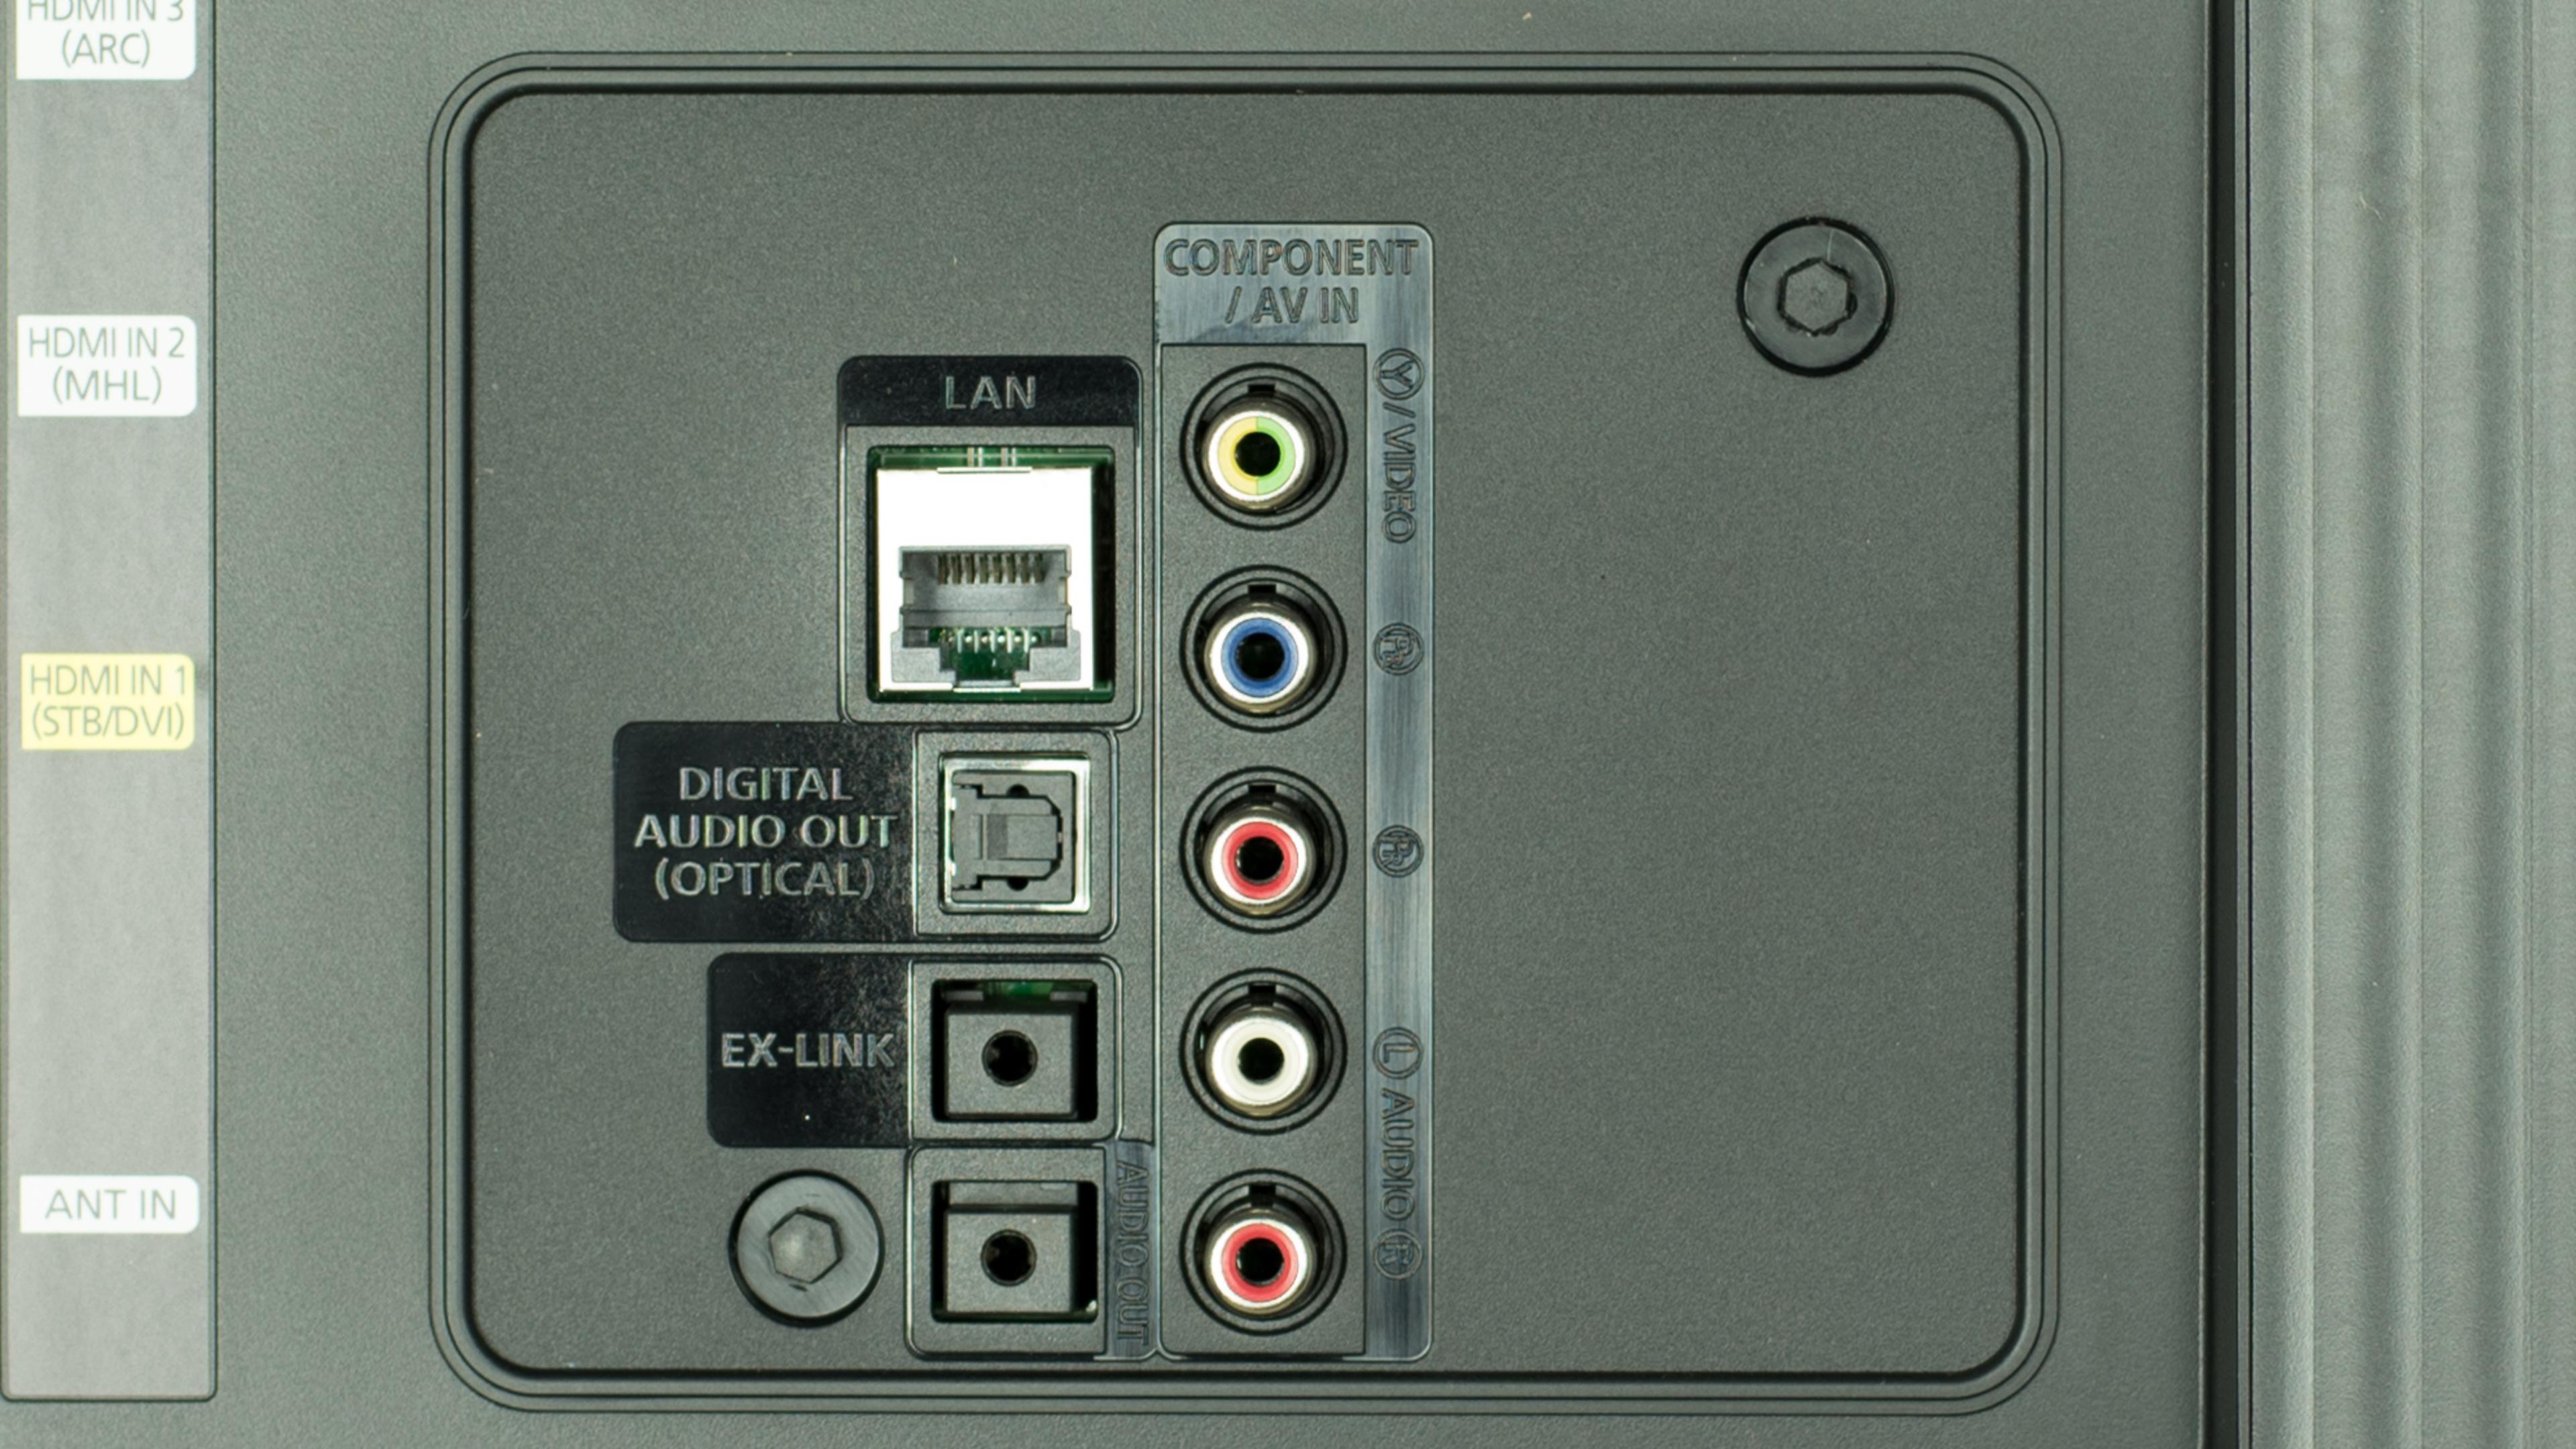 Samsung Ju6700 Review Un40ju6700 Un48ju6700 Un55ju6700